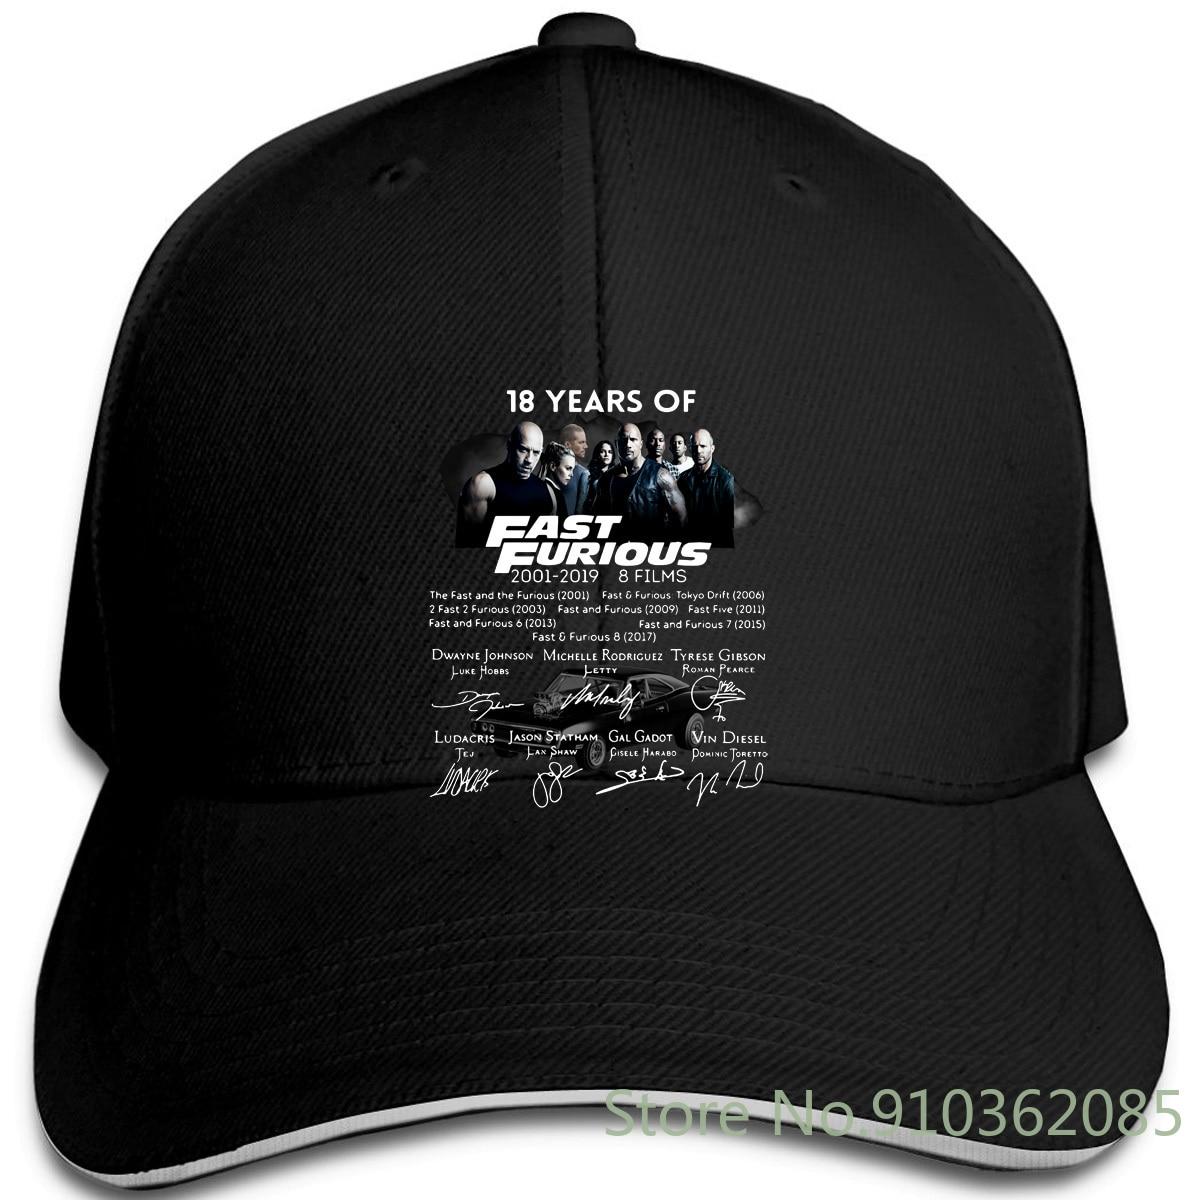 18 años de Fast Furious 2001-8 películas de firma negro-Azul marino Unisex diferentes colores gorras ajustables gorra de béisbol hombres mujeres